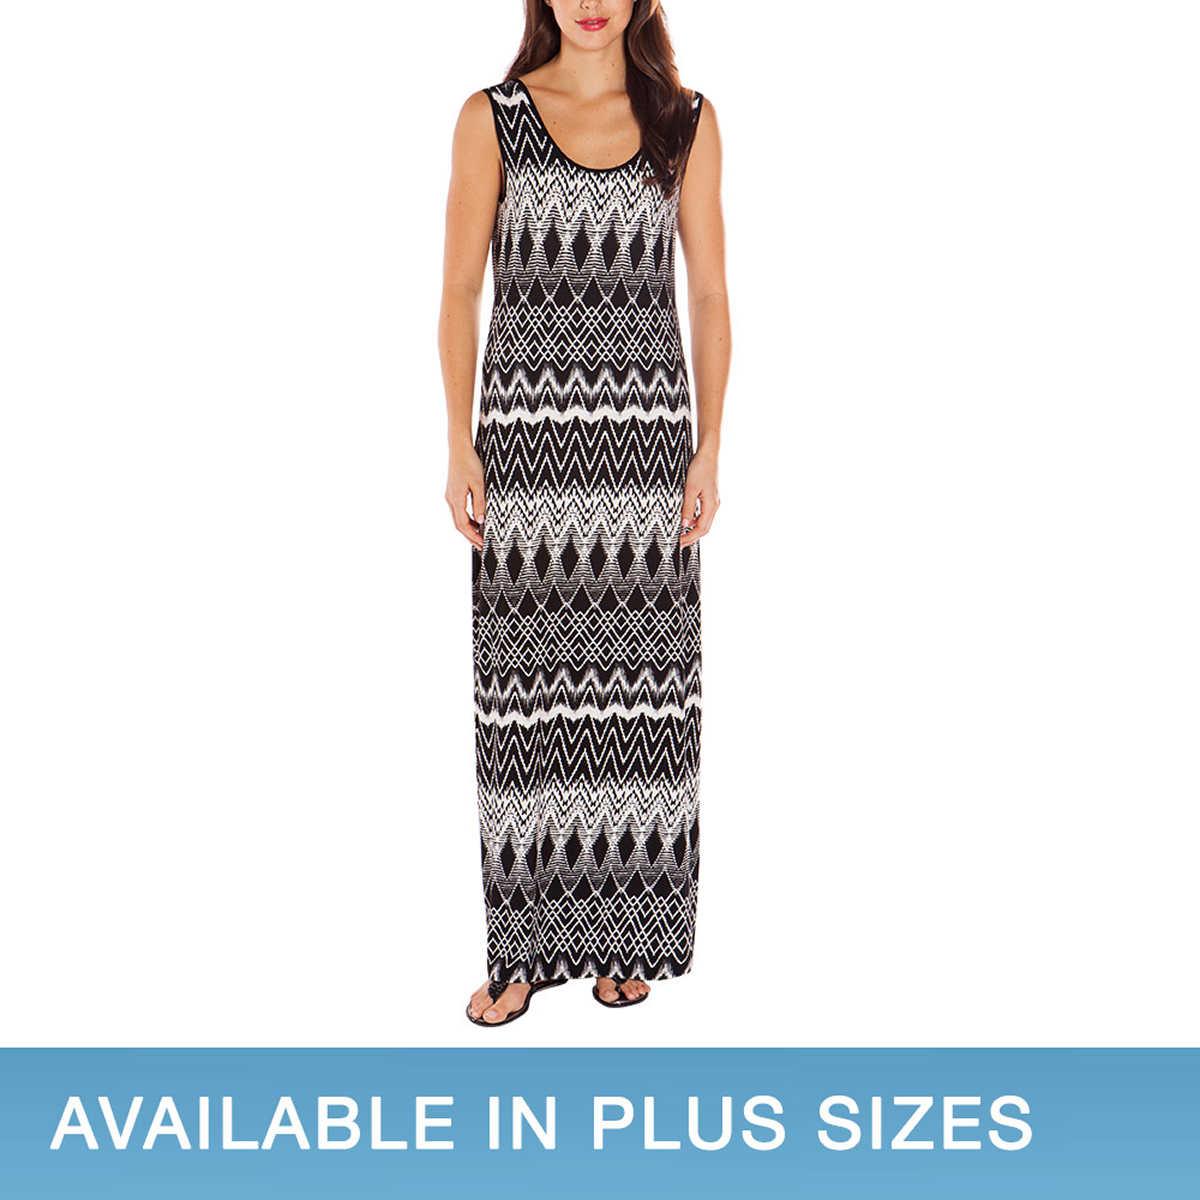 Blue apron costco - Out Of Stock Mario Serrani Ladies Maxi Dress Black White Zig Zag Pattern